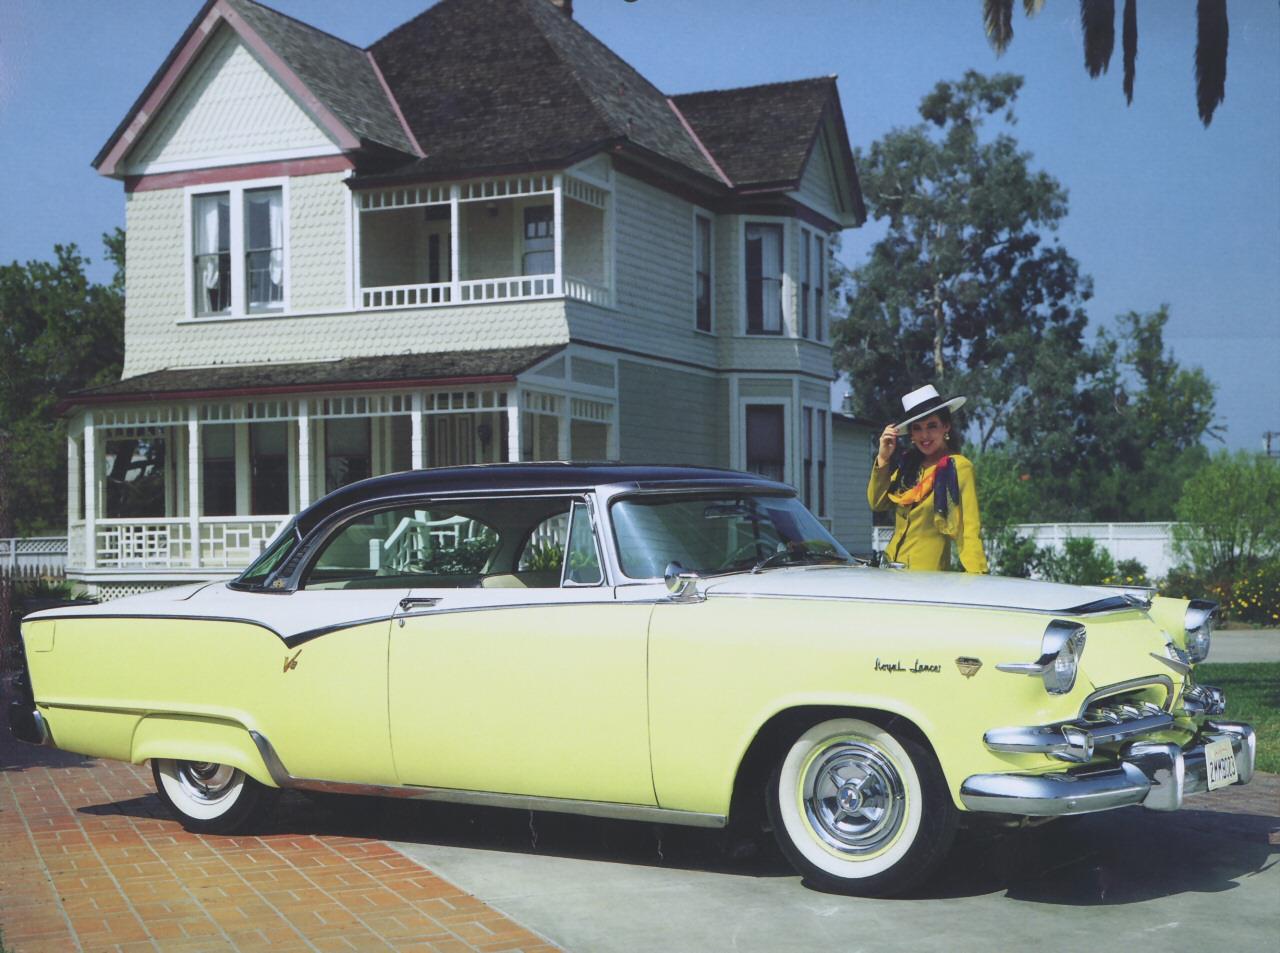 1955 dodge custom royal lancer 4 door sedan 15699 - Cars 1955 Dodge Custom Royal 1955 Dodge Custom Royal